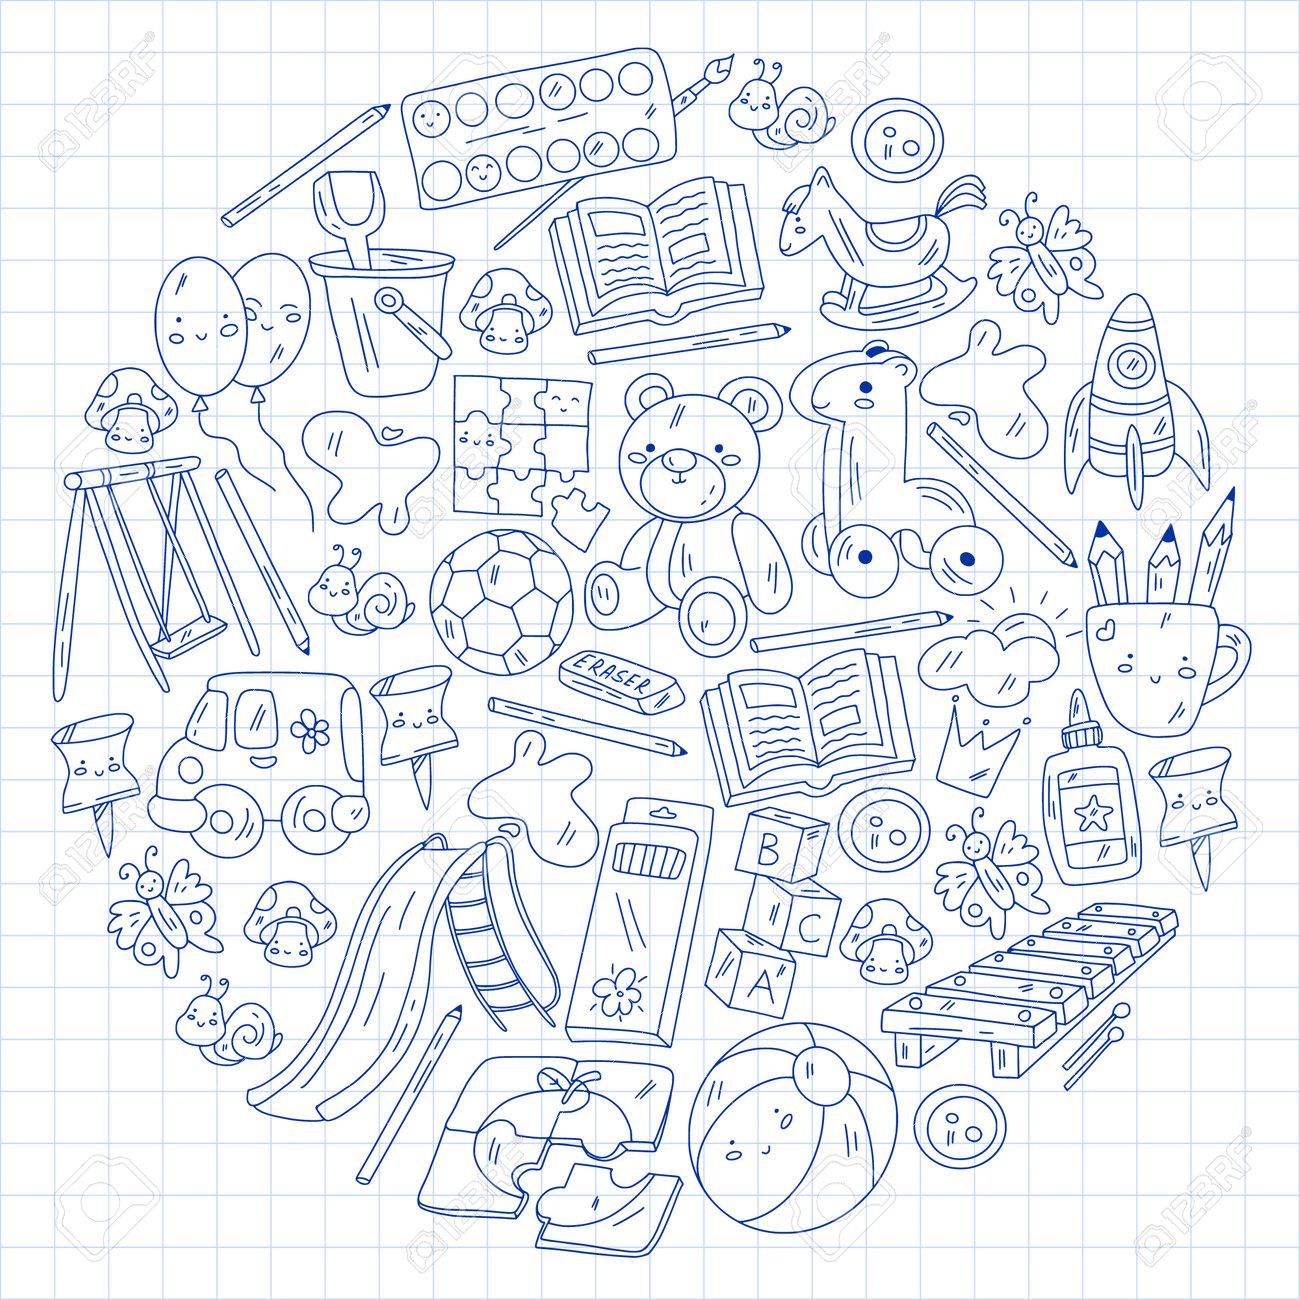 Children play with toys in the kindergarten. Kids playground. Education, creativity, imagination. - 173369665